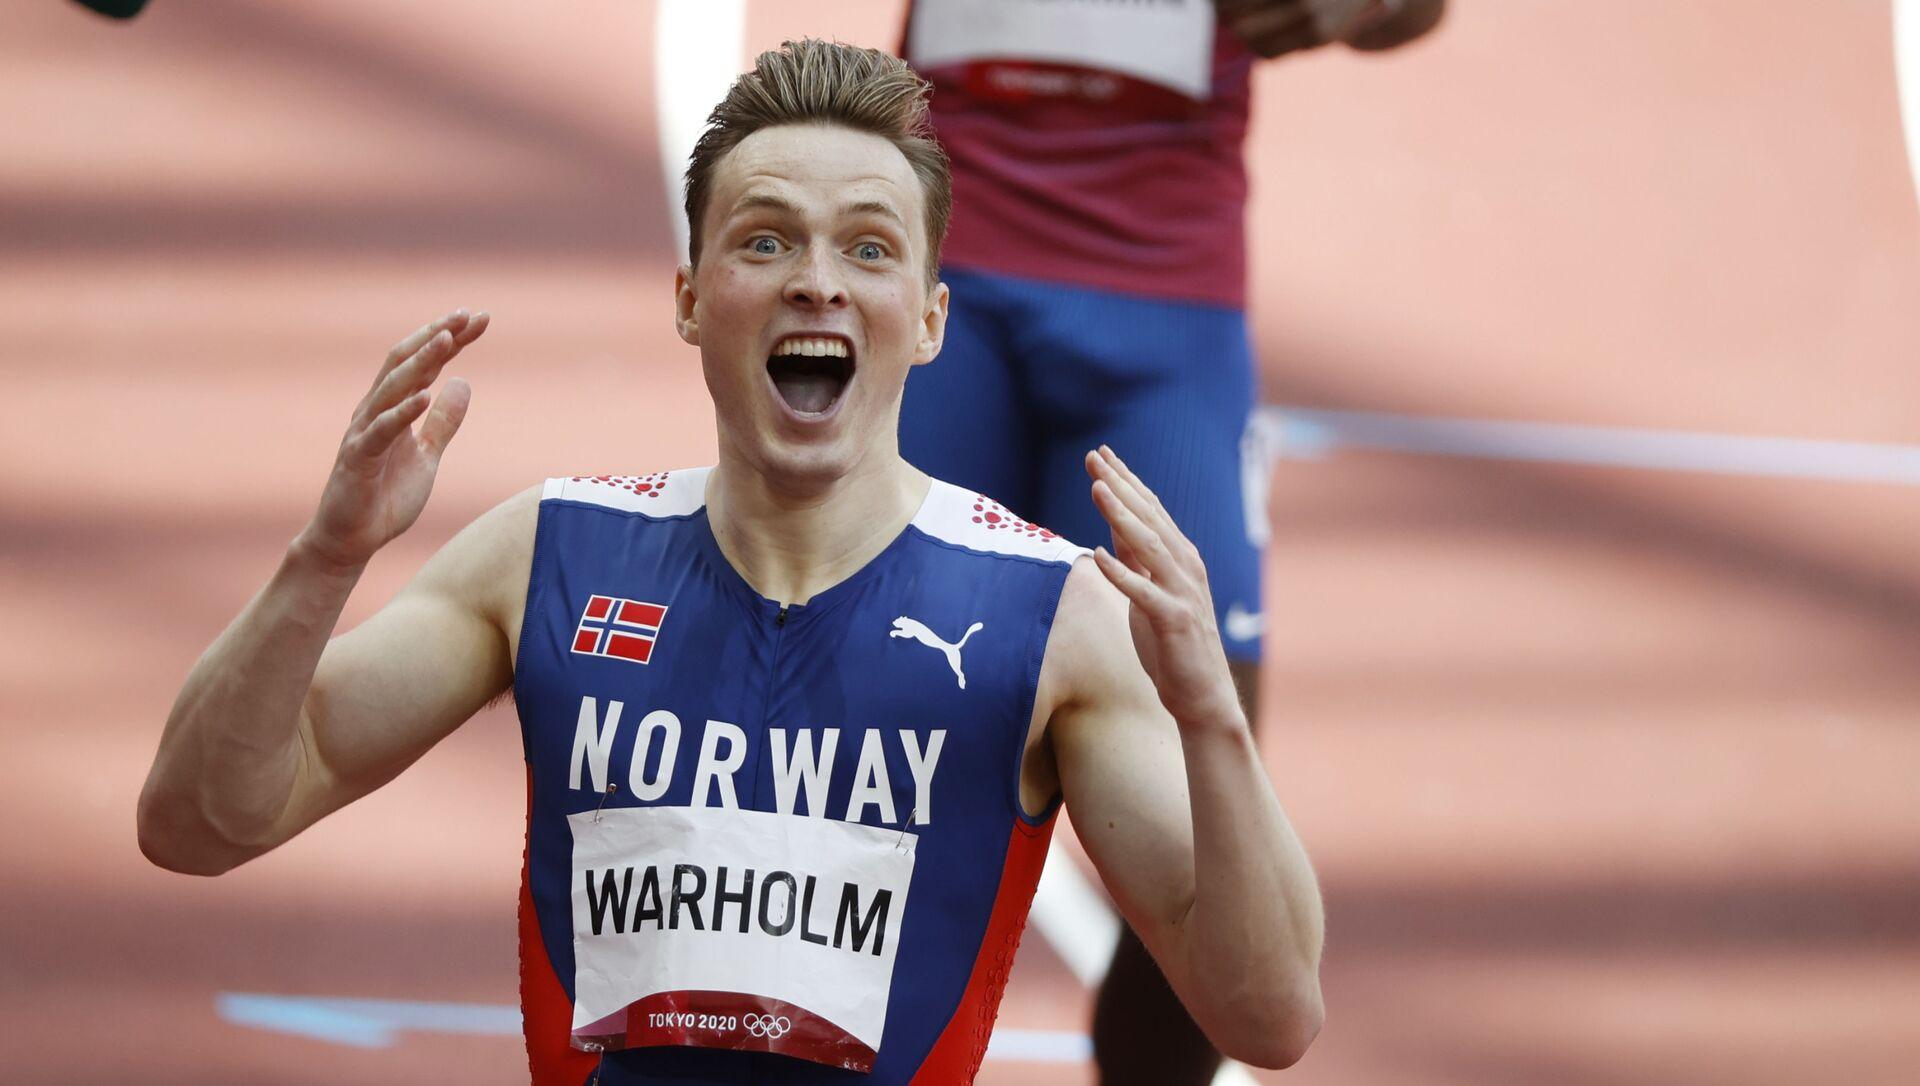 Karsten Warholm of Norway celebrates after winning gold and setting a new world record - Sputnik International, 1920, 03.08.2021